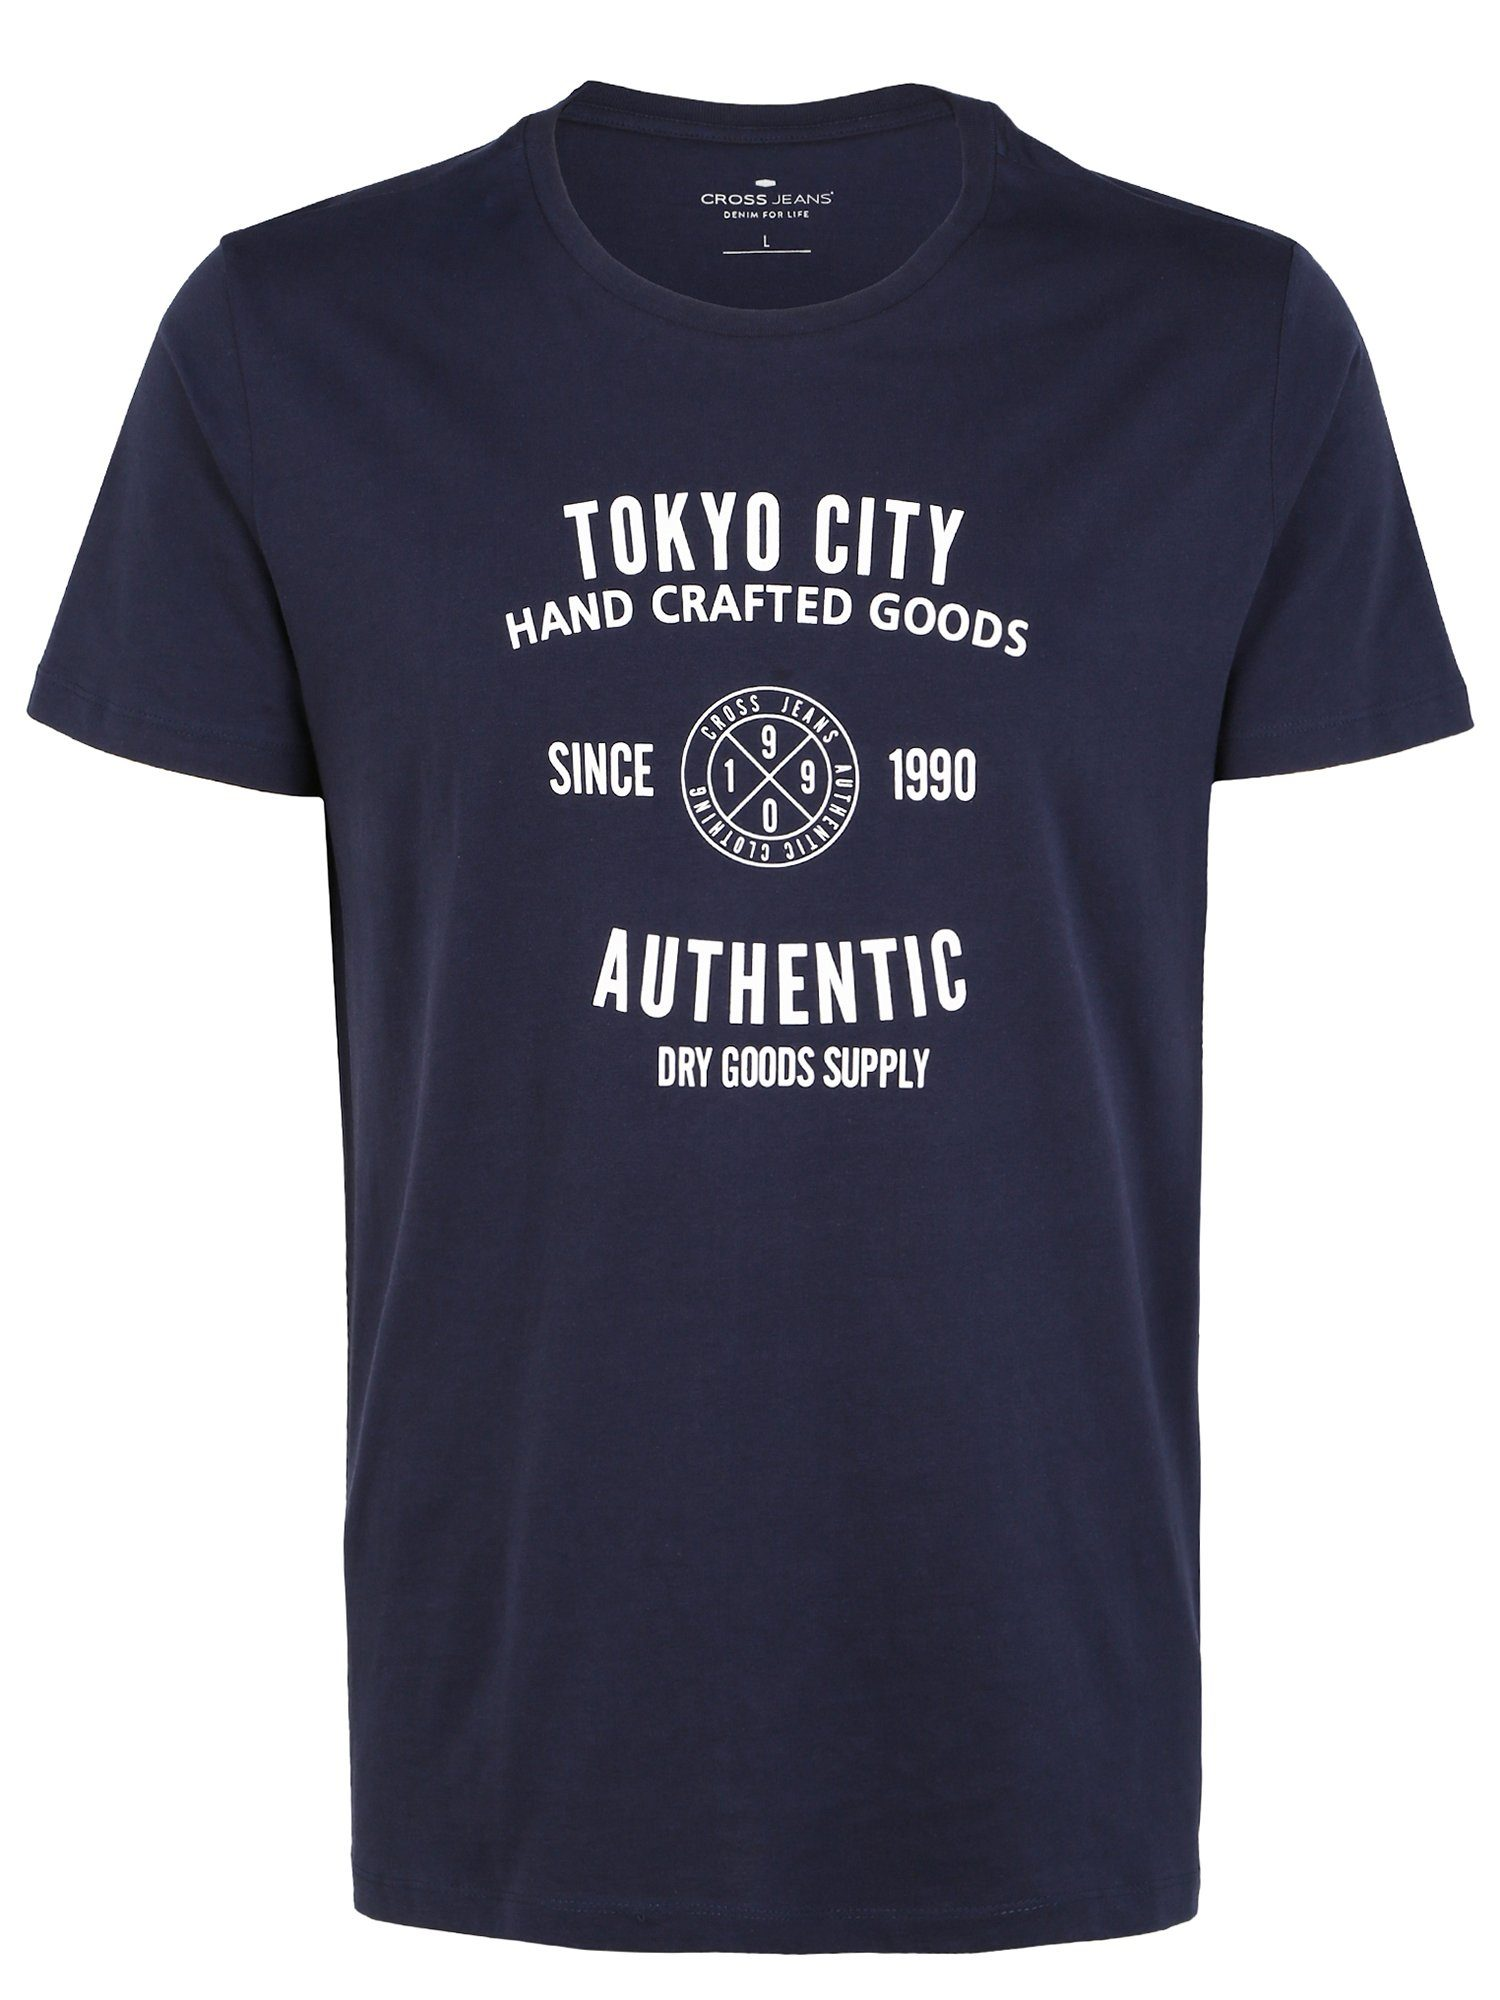 Cross Jeans T-shirt 15567 Online Shoppen - Geweldige Prijs